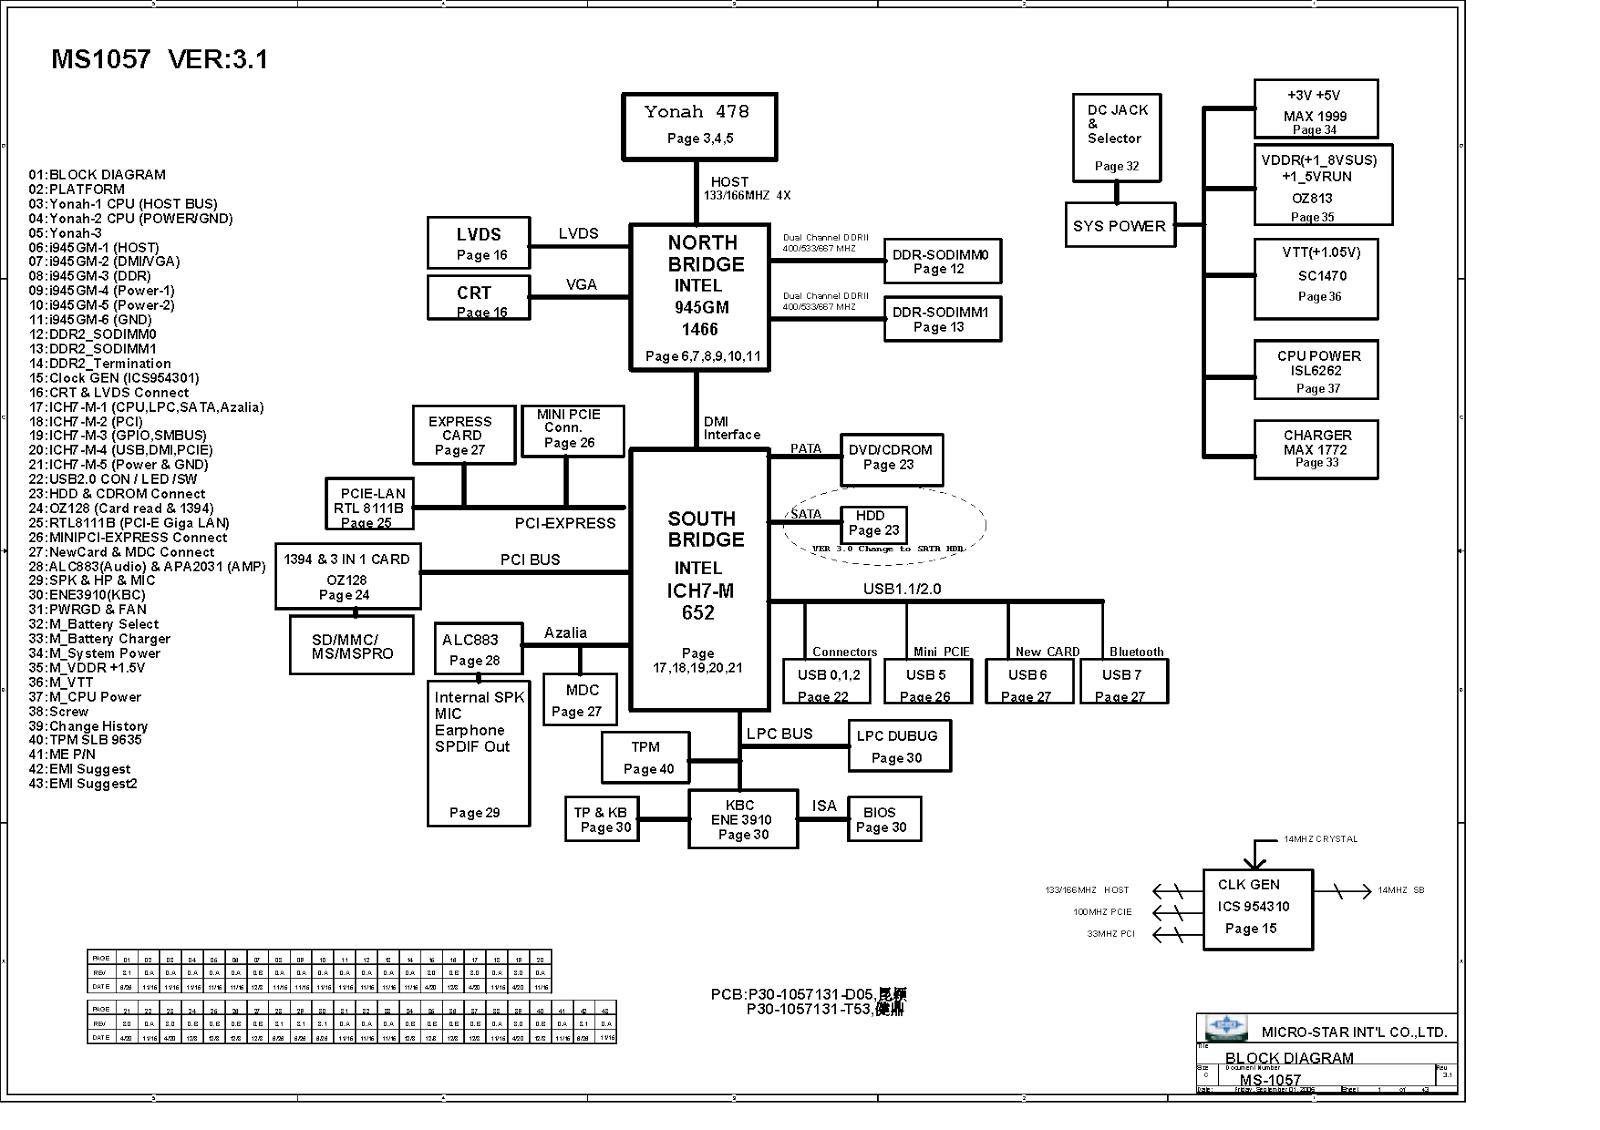 the motherboard schematic for msi megabook s262 laptop notebook ms 1057 motherboard cpu yonah 478 north bridge intel 945gm south bridge intel ich7 m [ 1600 x 1130 Pixel ]